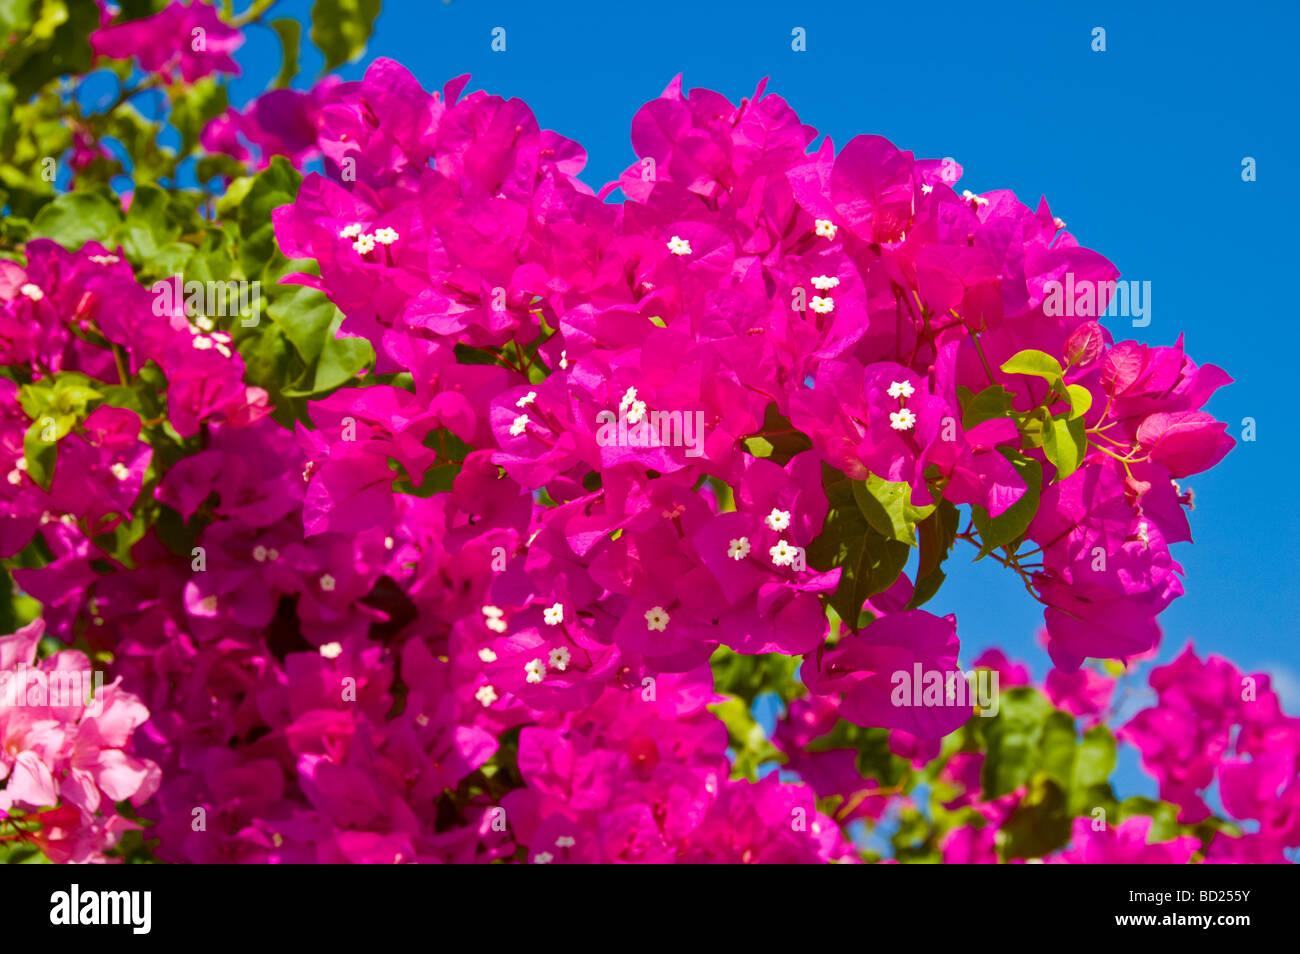 Pink mediterranean flower stock photos pink mediterranean flower pink bougainvillaea on the mediterranean greek island of kefalonia greece gr stock image mightylinksfo